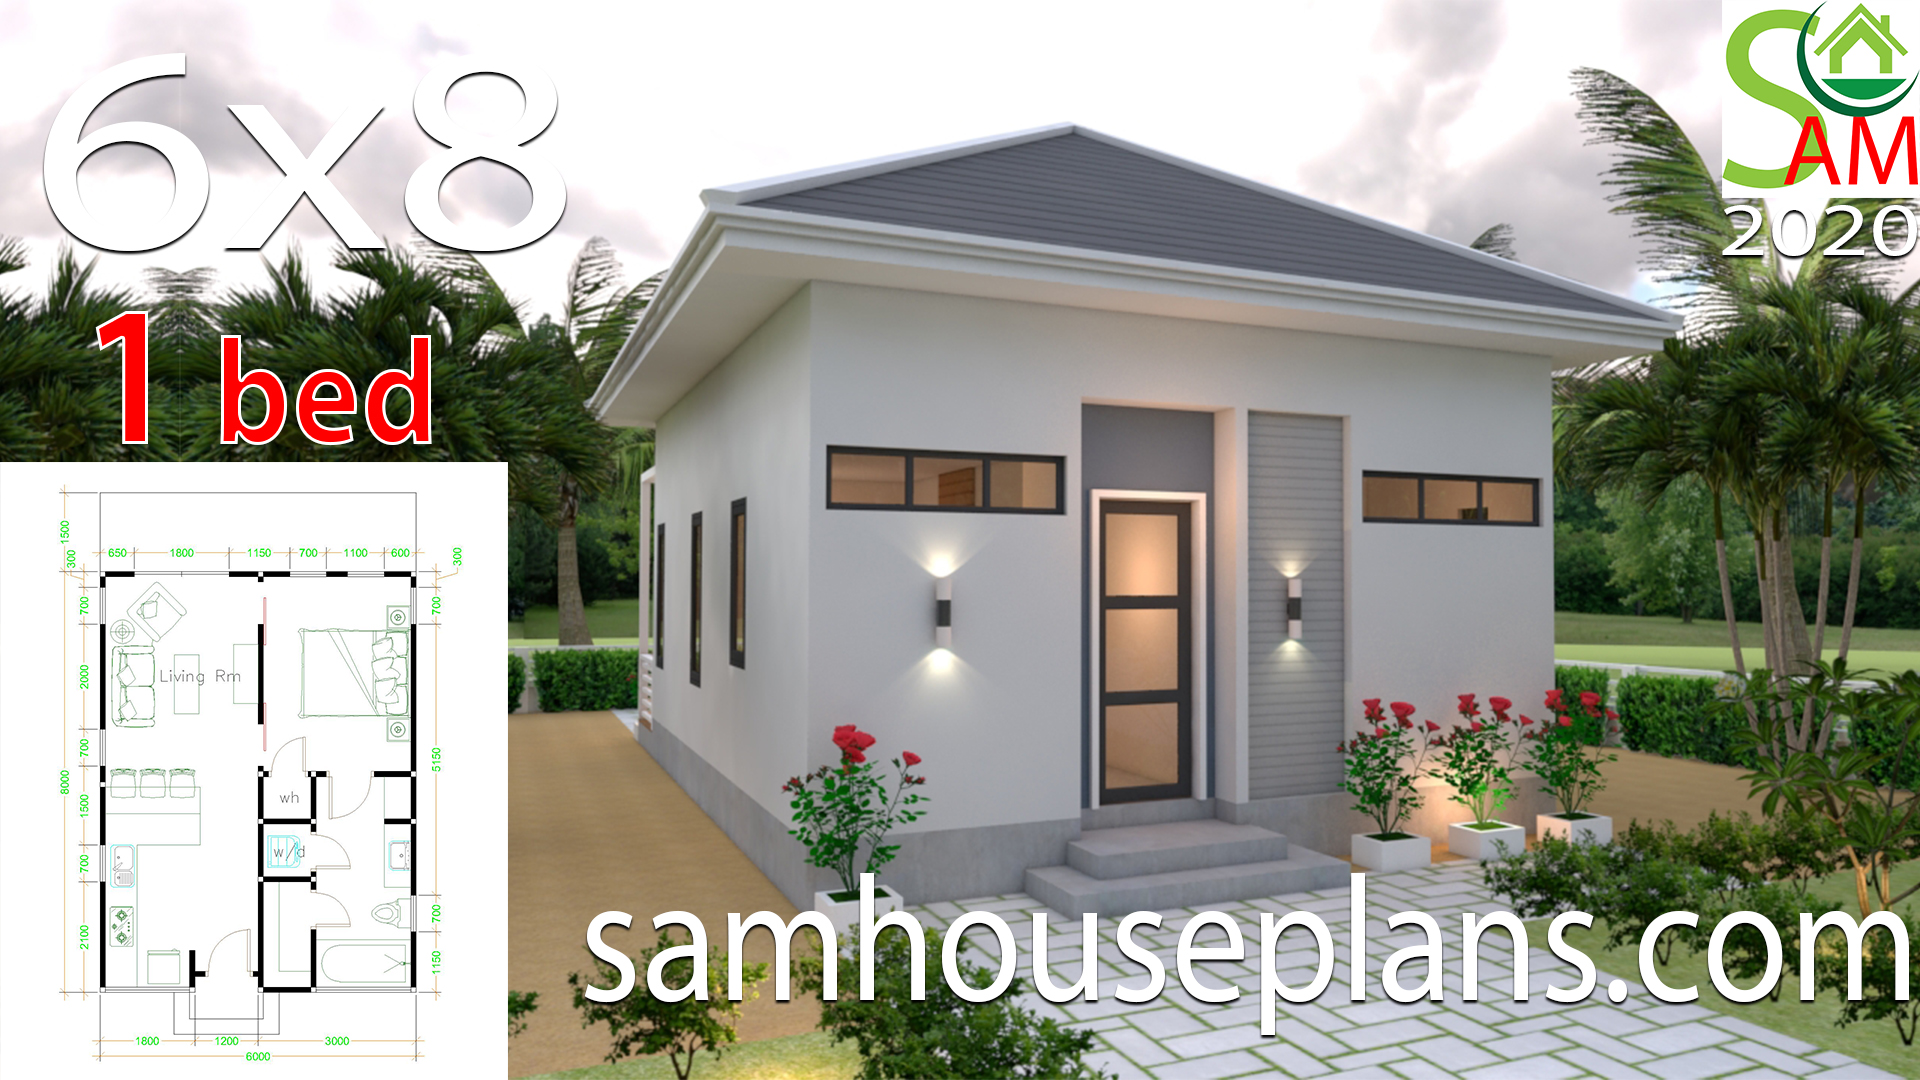 Studio House Plans 6x8 Hip Roof Samhouseplans